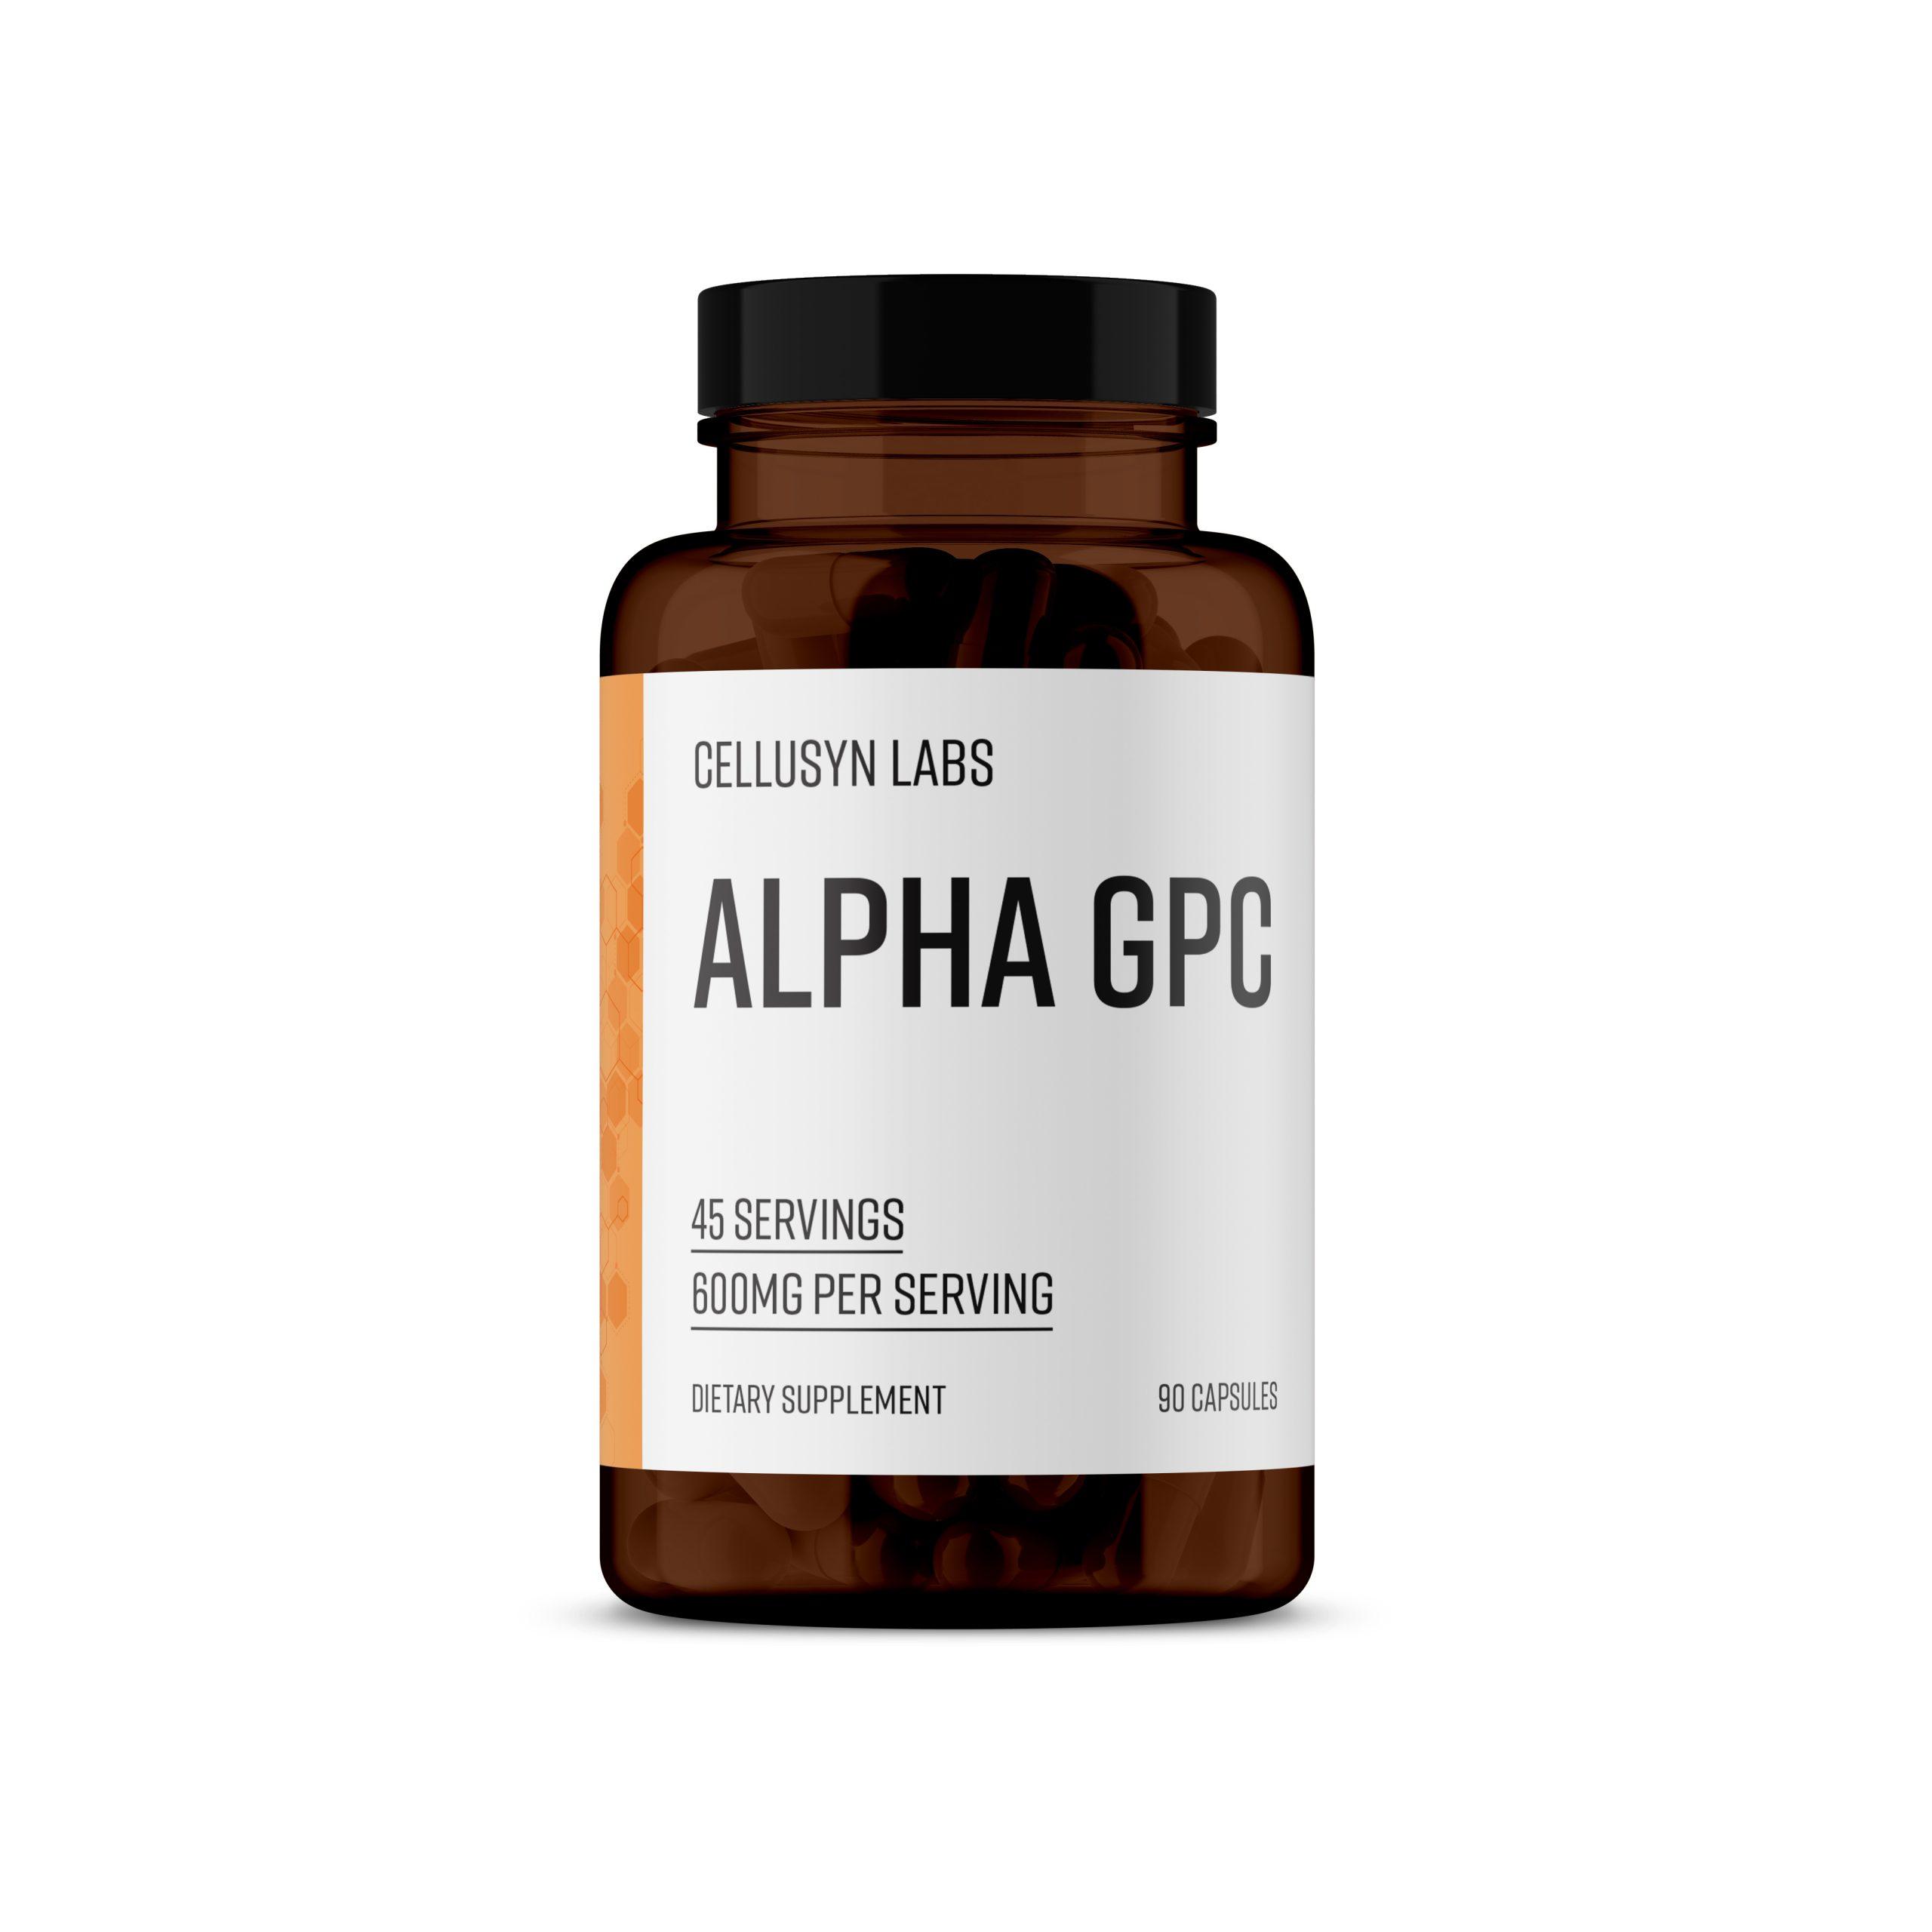 AlphaGPCBottle